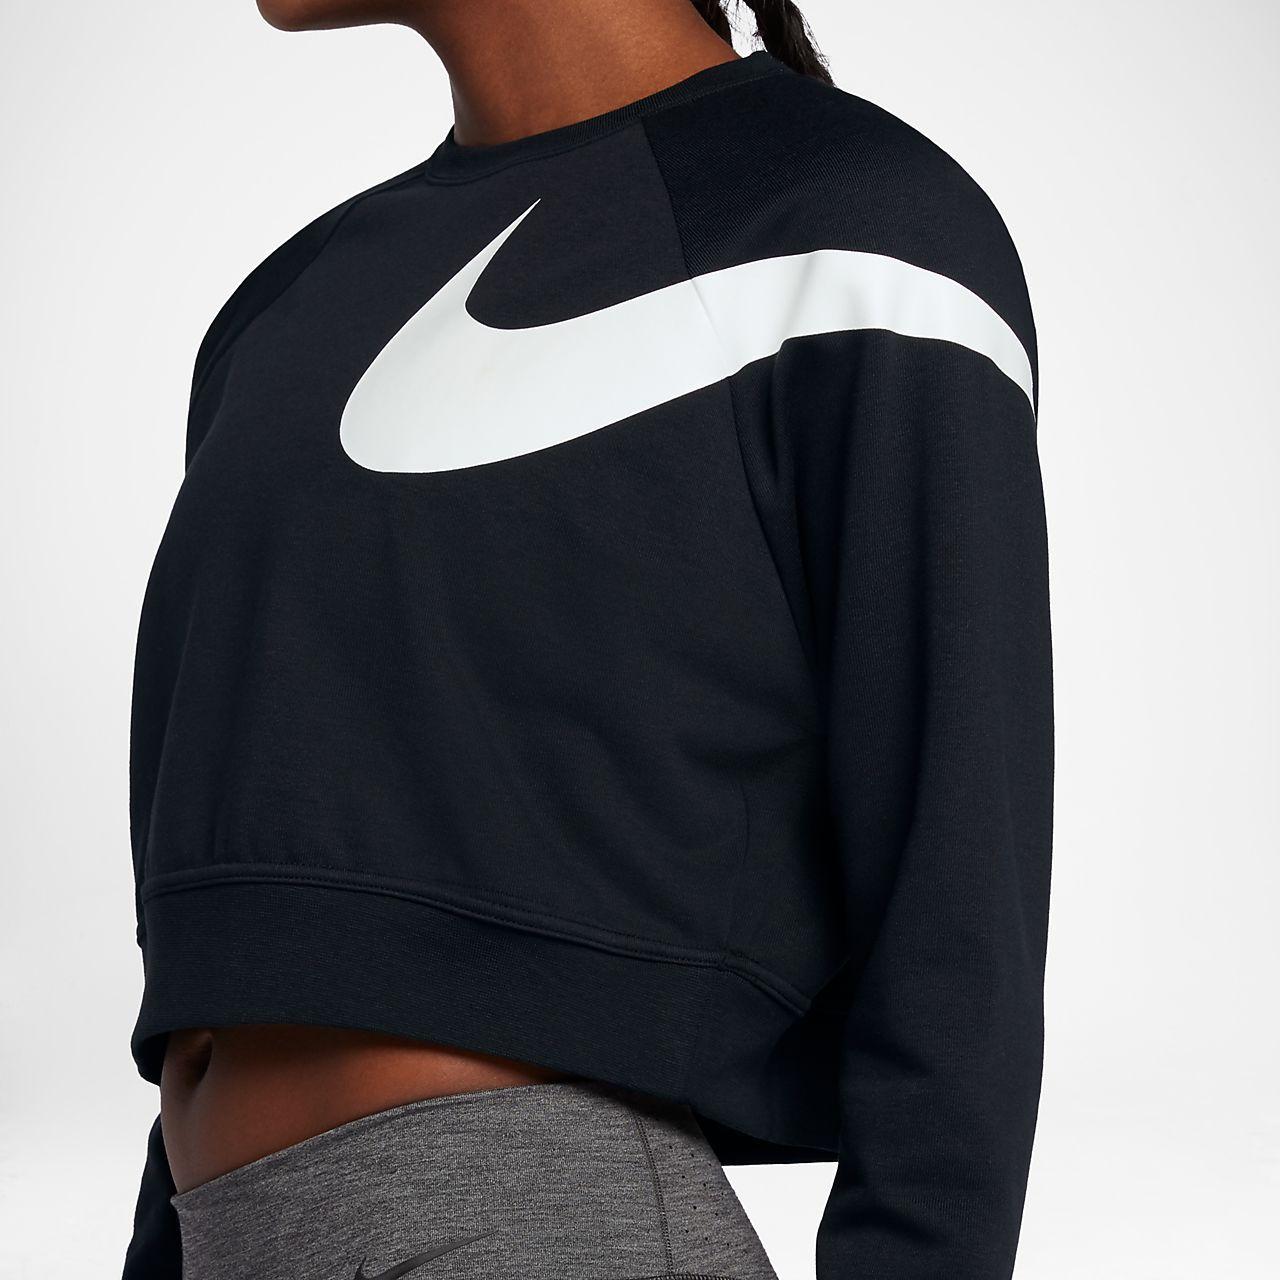 Versa Women's Training Dry Nike Long Sleeve 2019 Top in wkXuPTOiZl